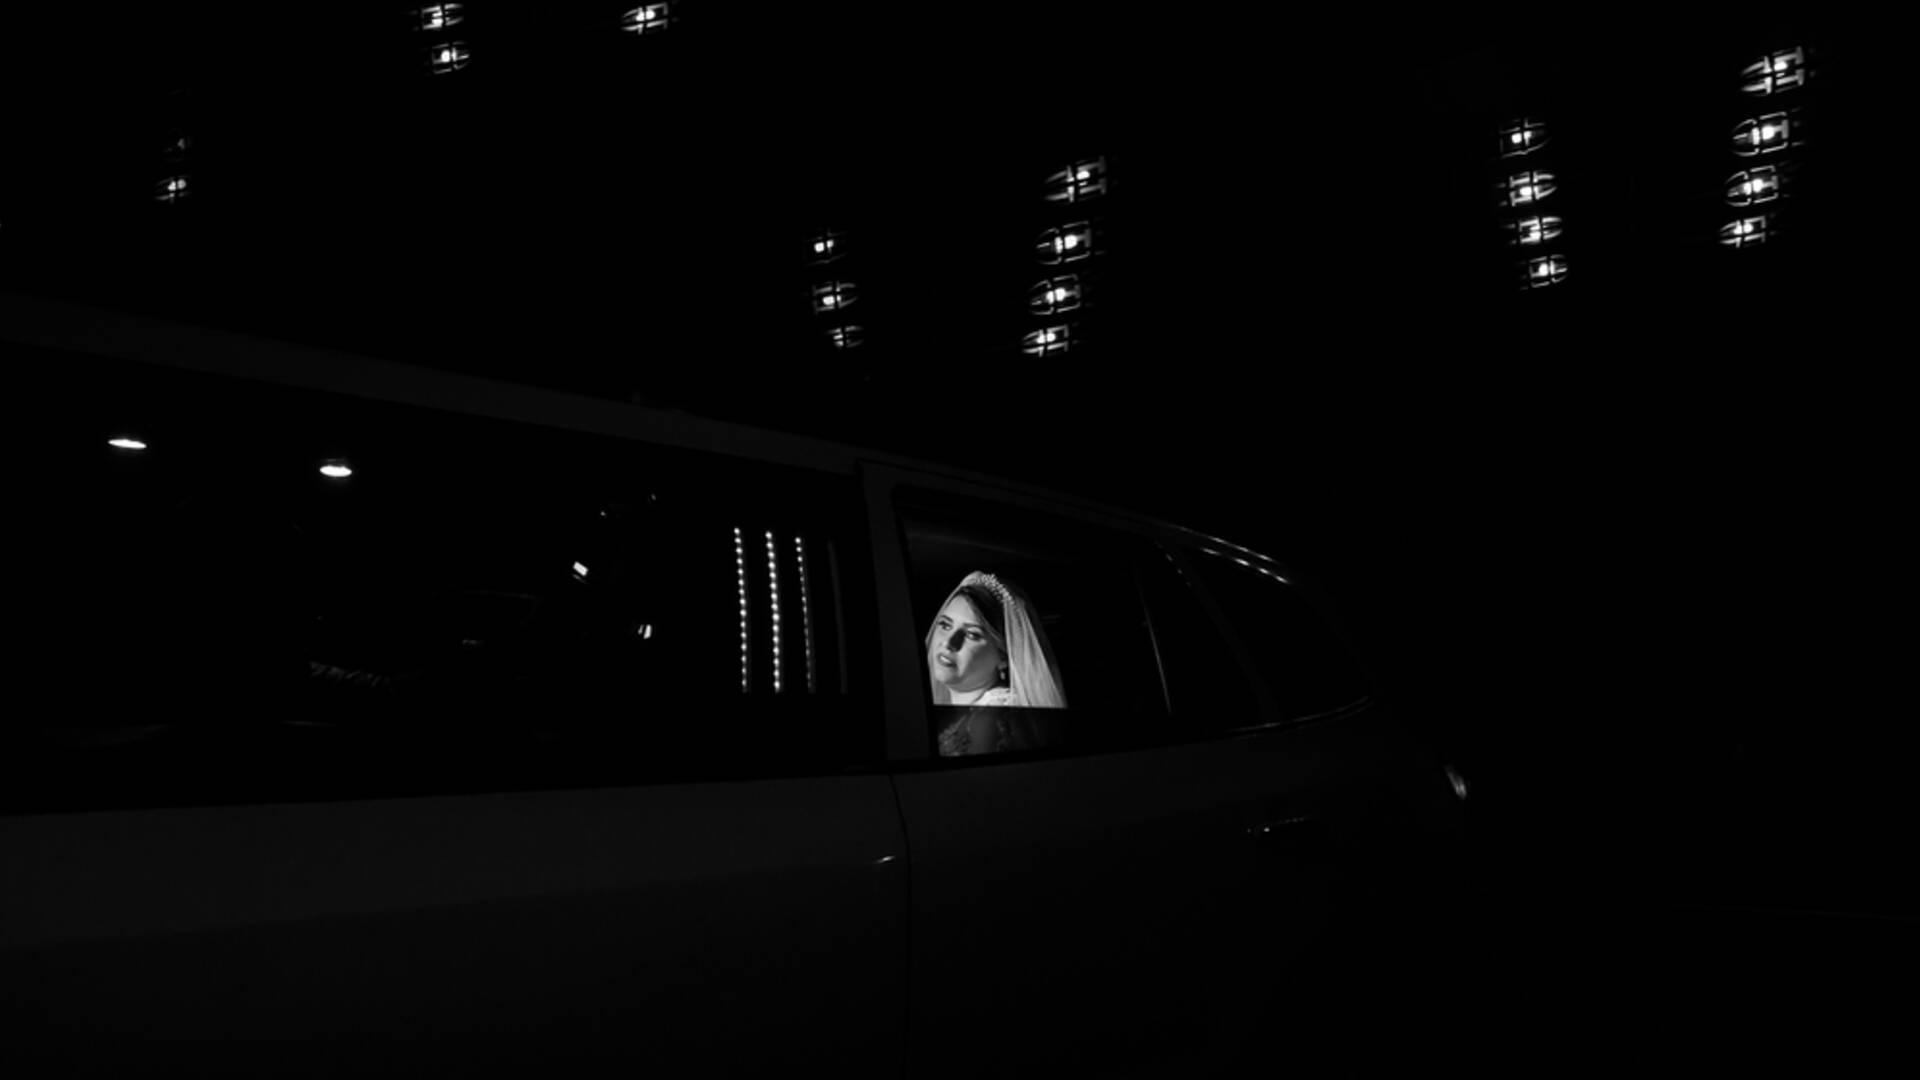 Casamento de A chegada da noiva